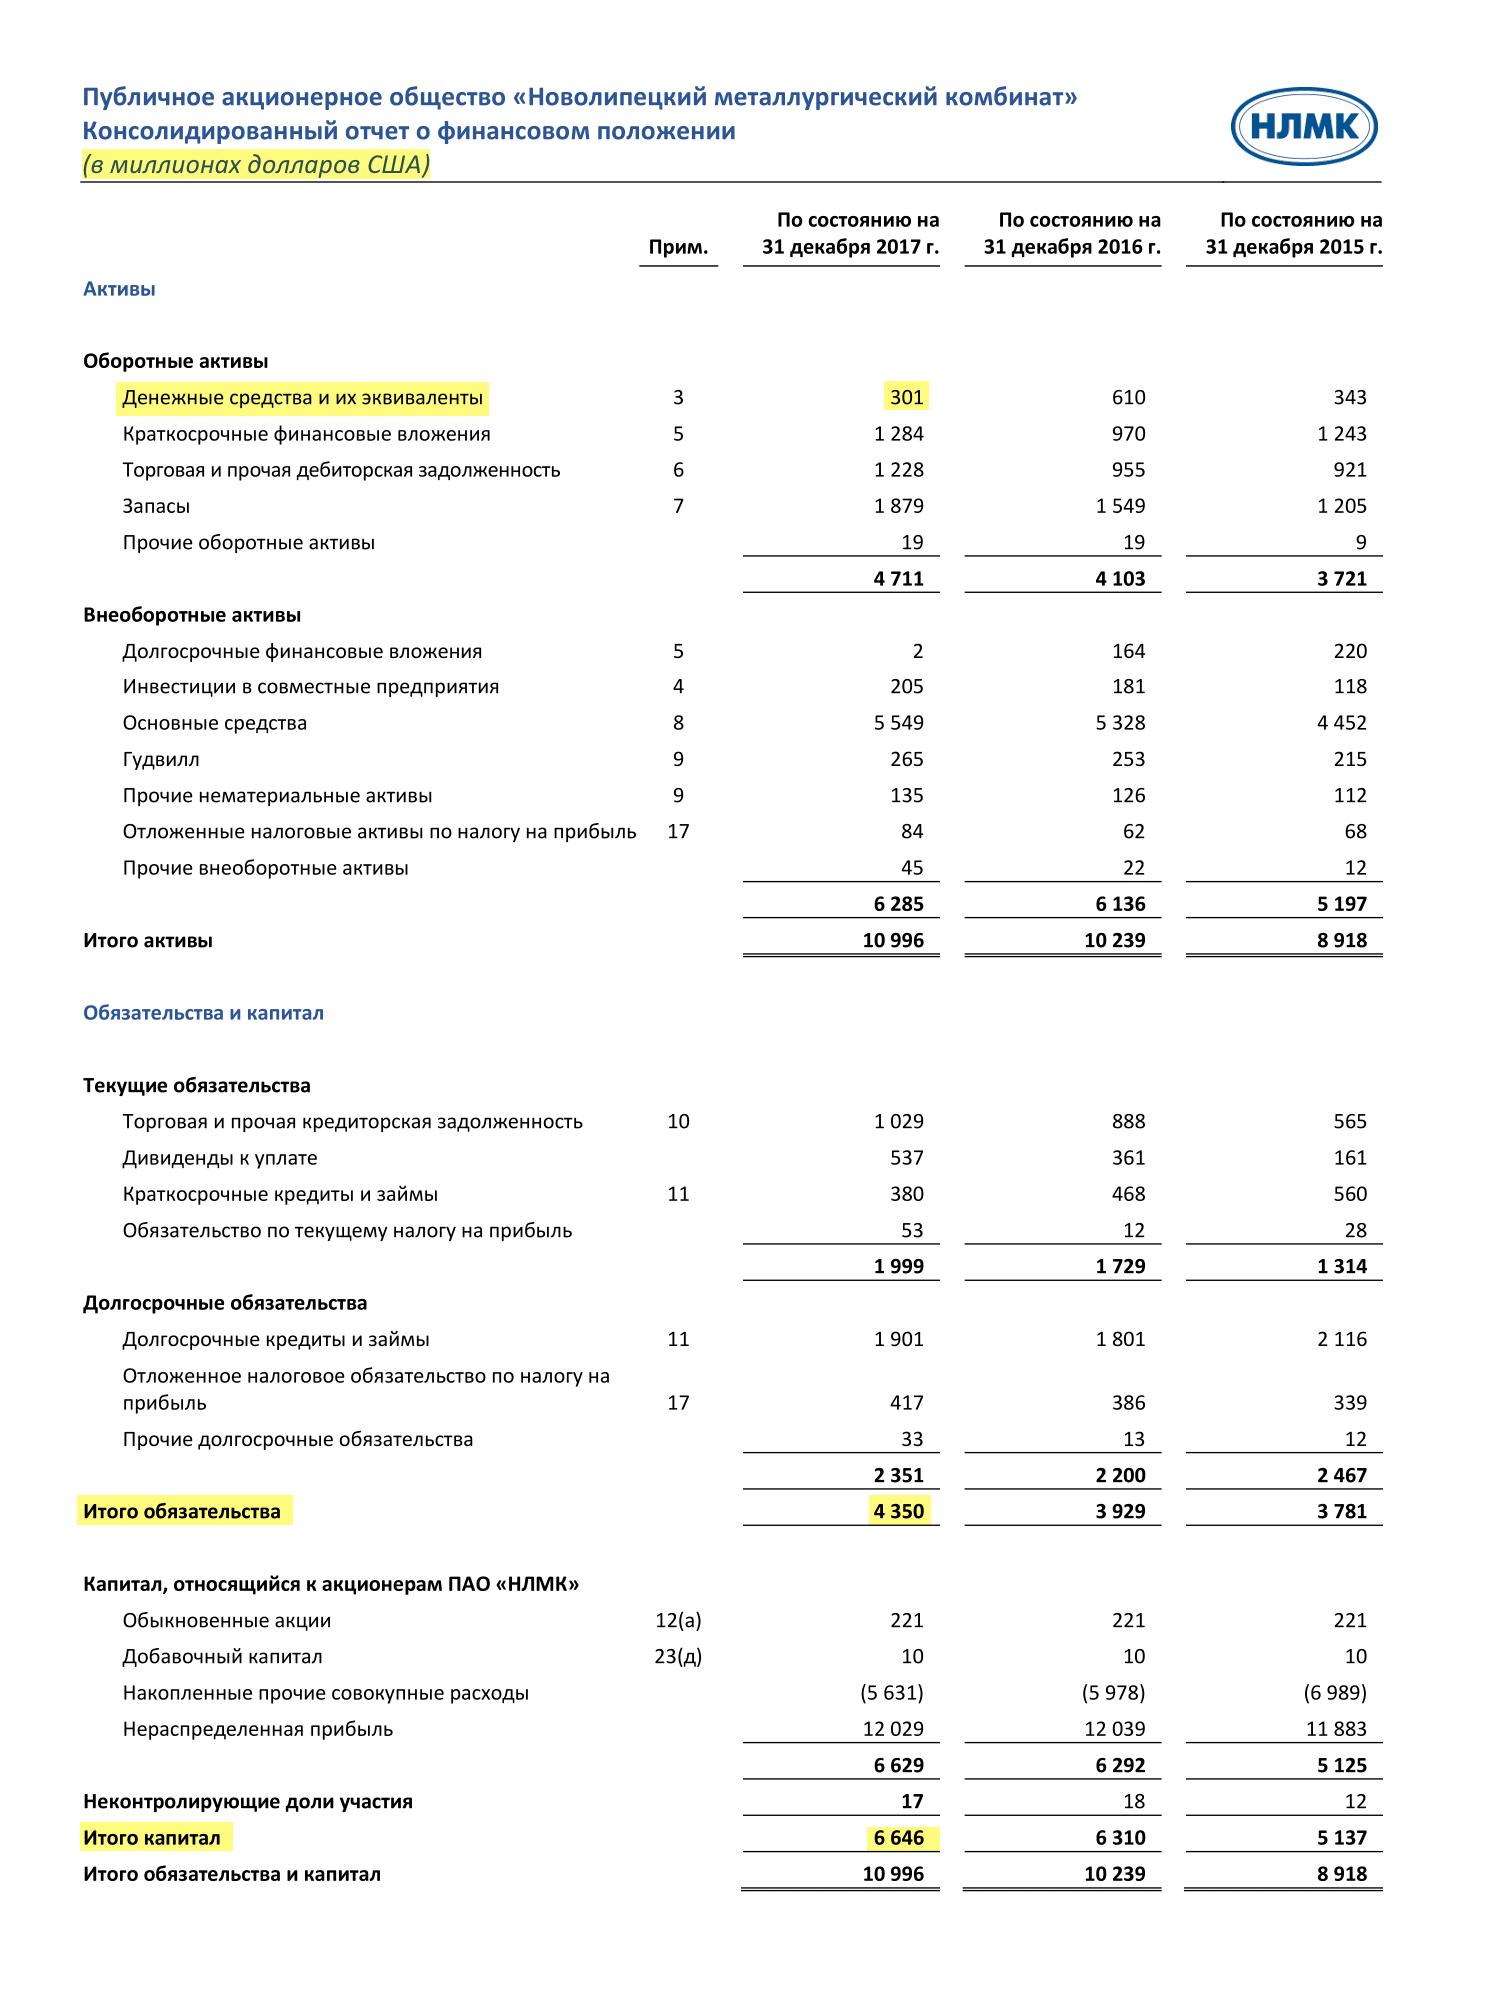 Страница 13 отчета НЛМК по итогам 2017 года